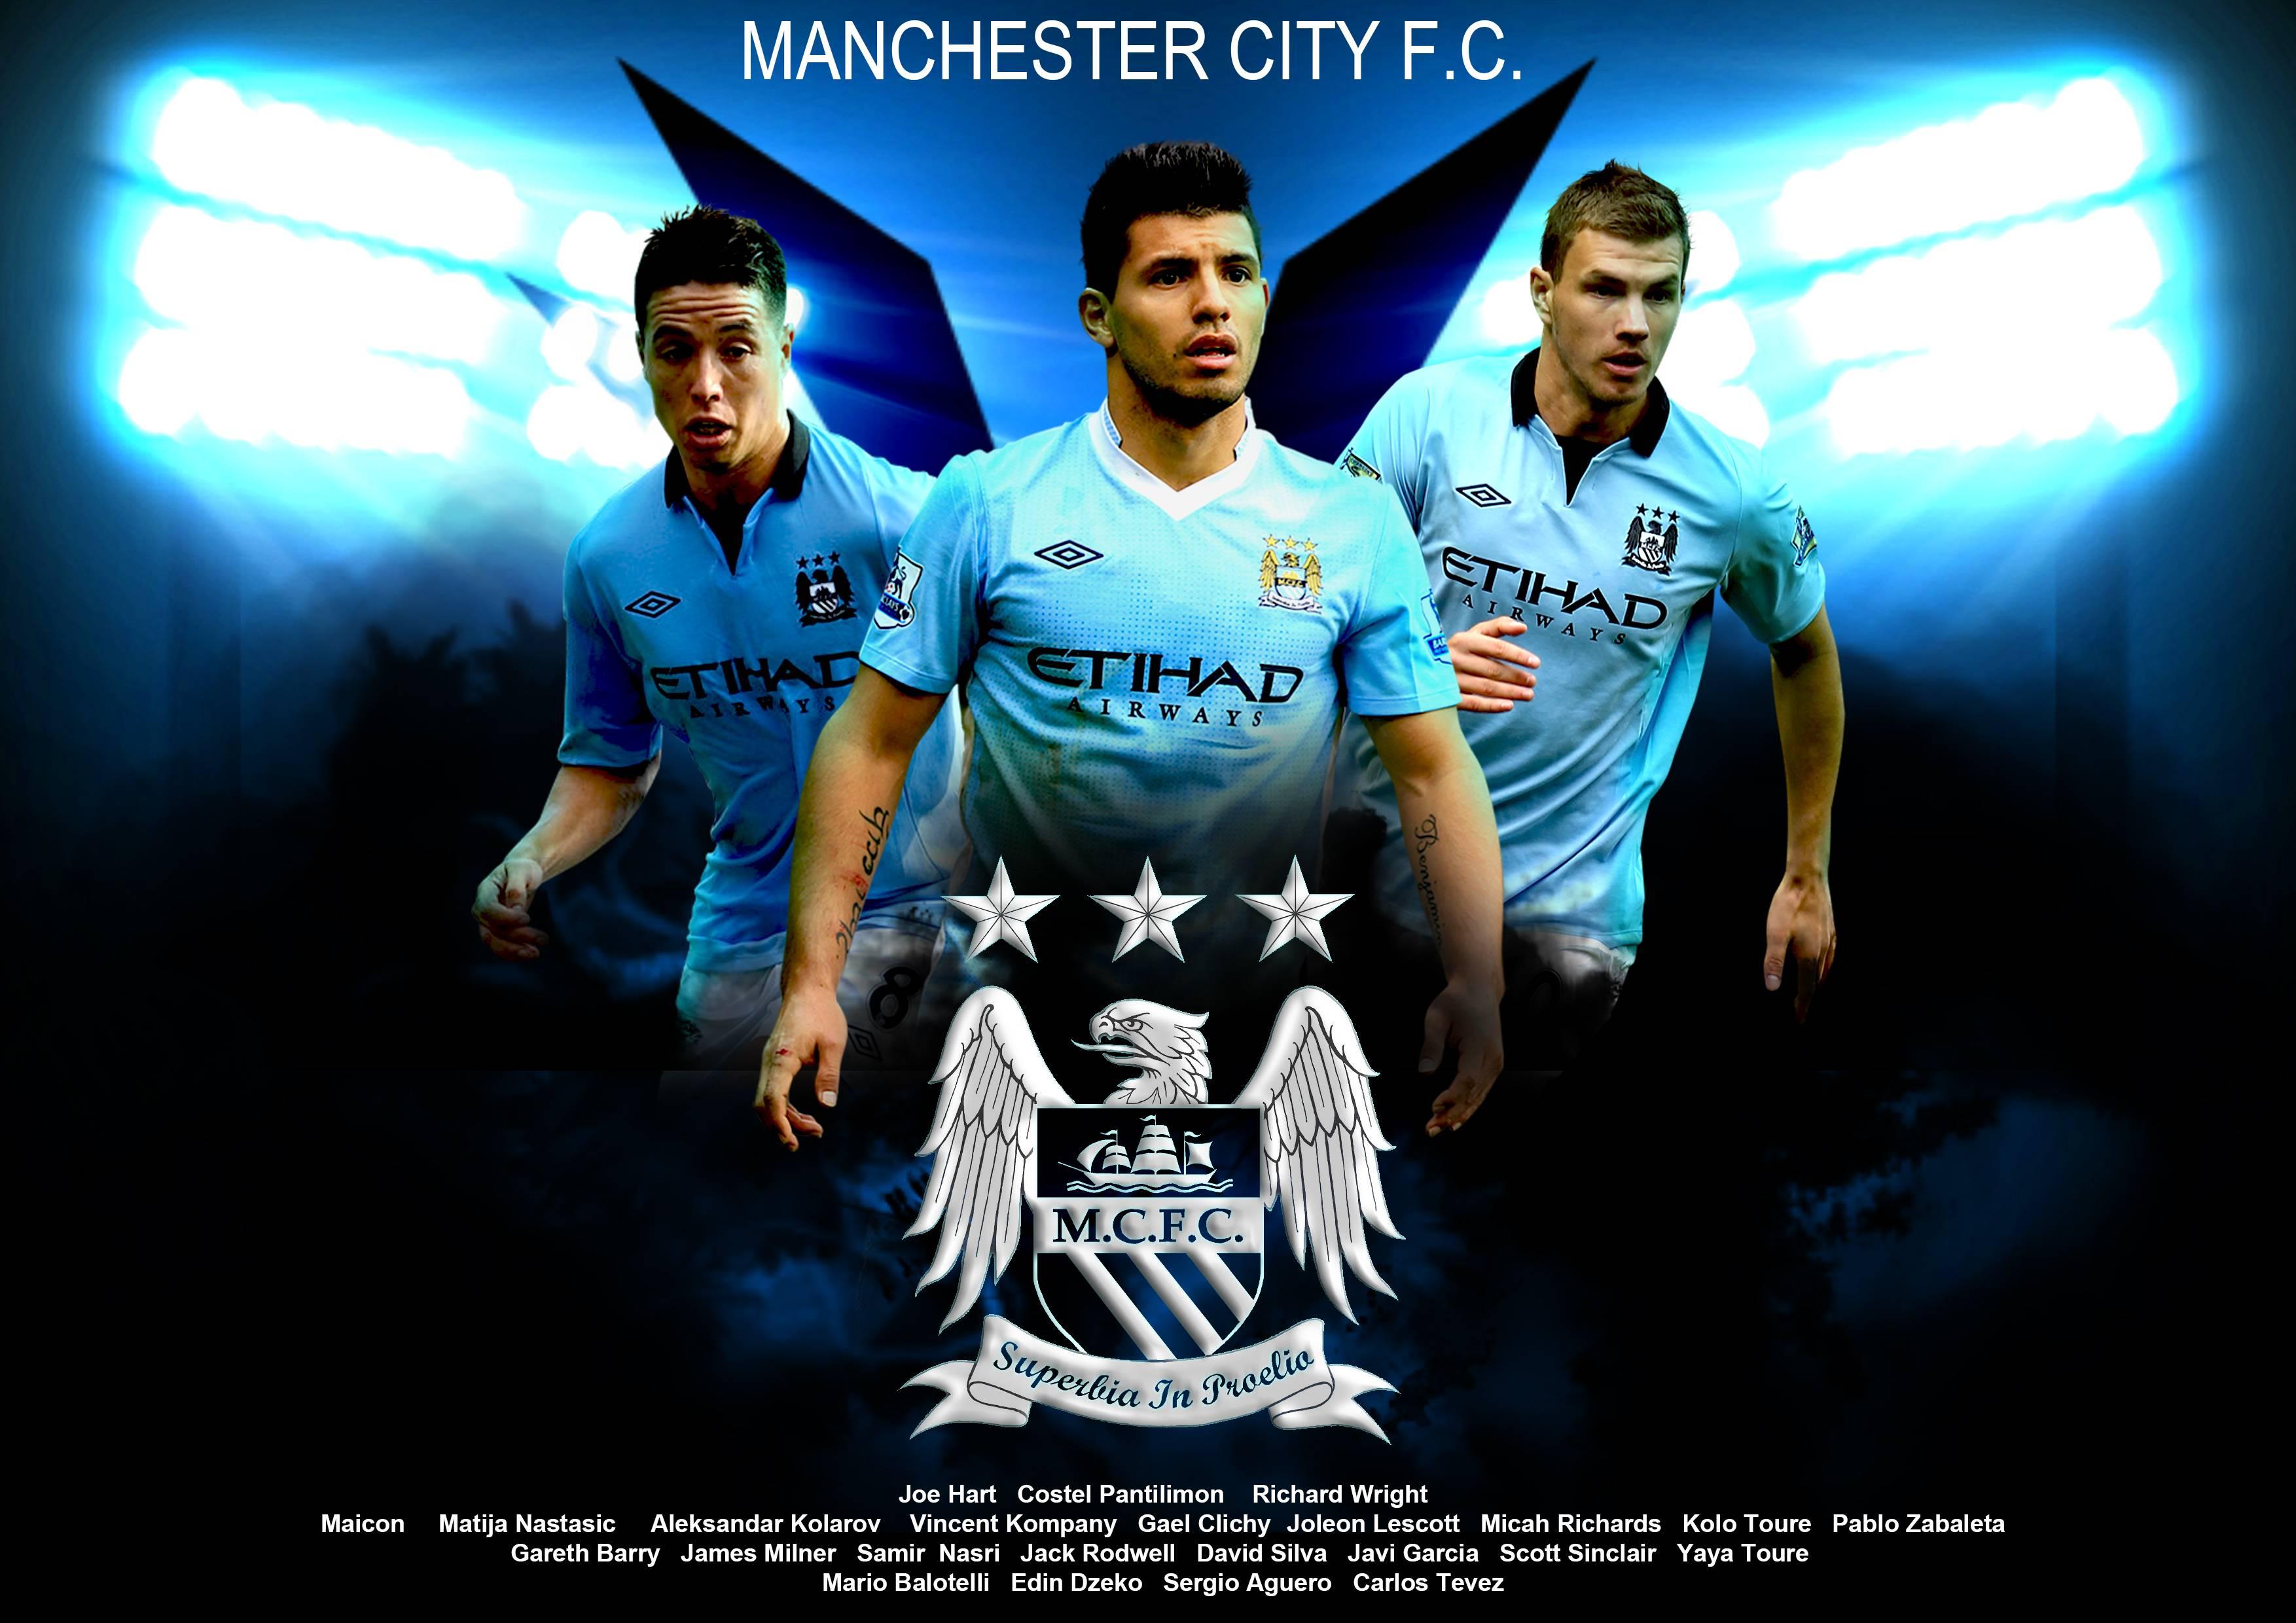 Manchester City Wallpaper: Manchester City Backgrounds